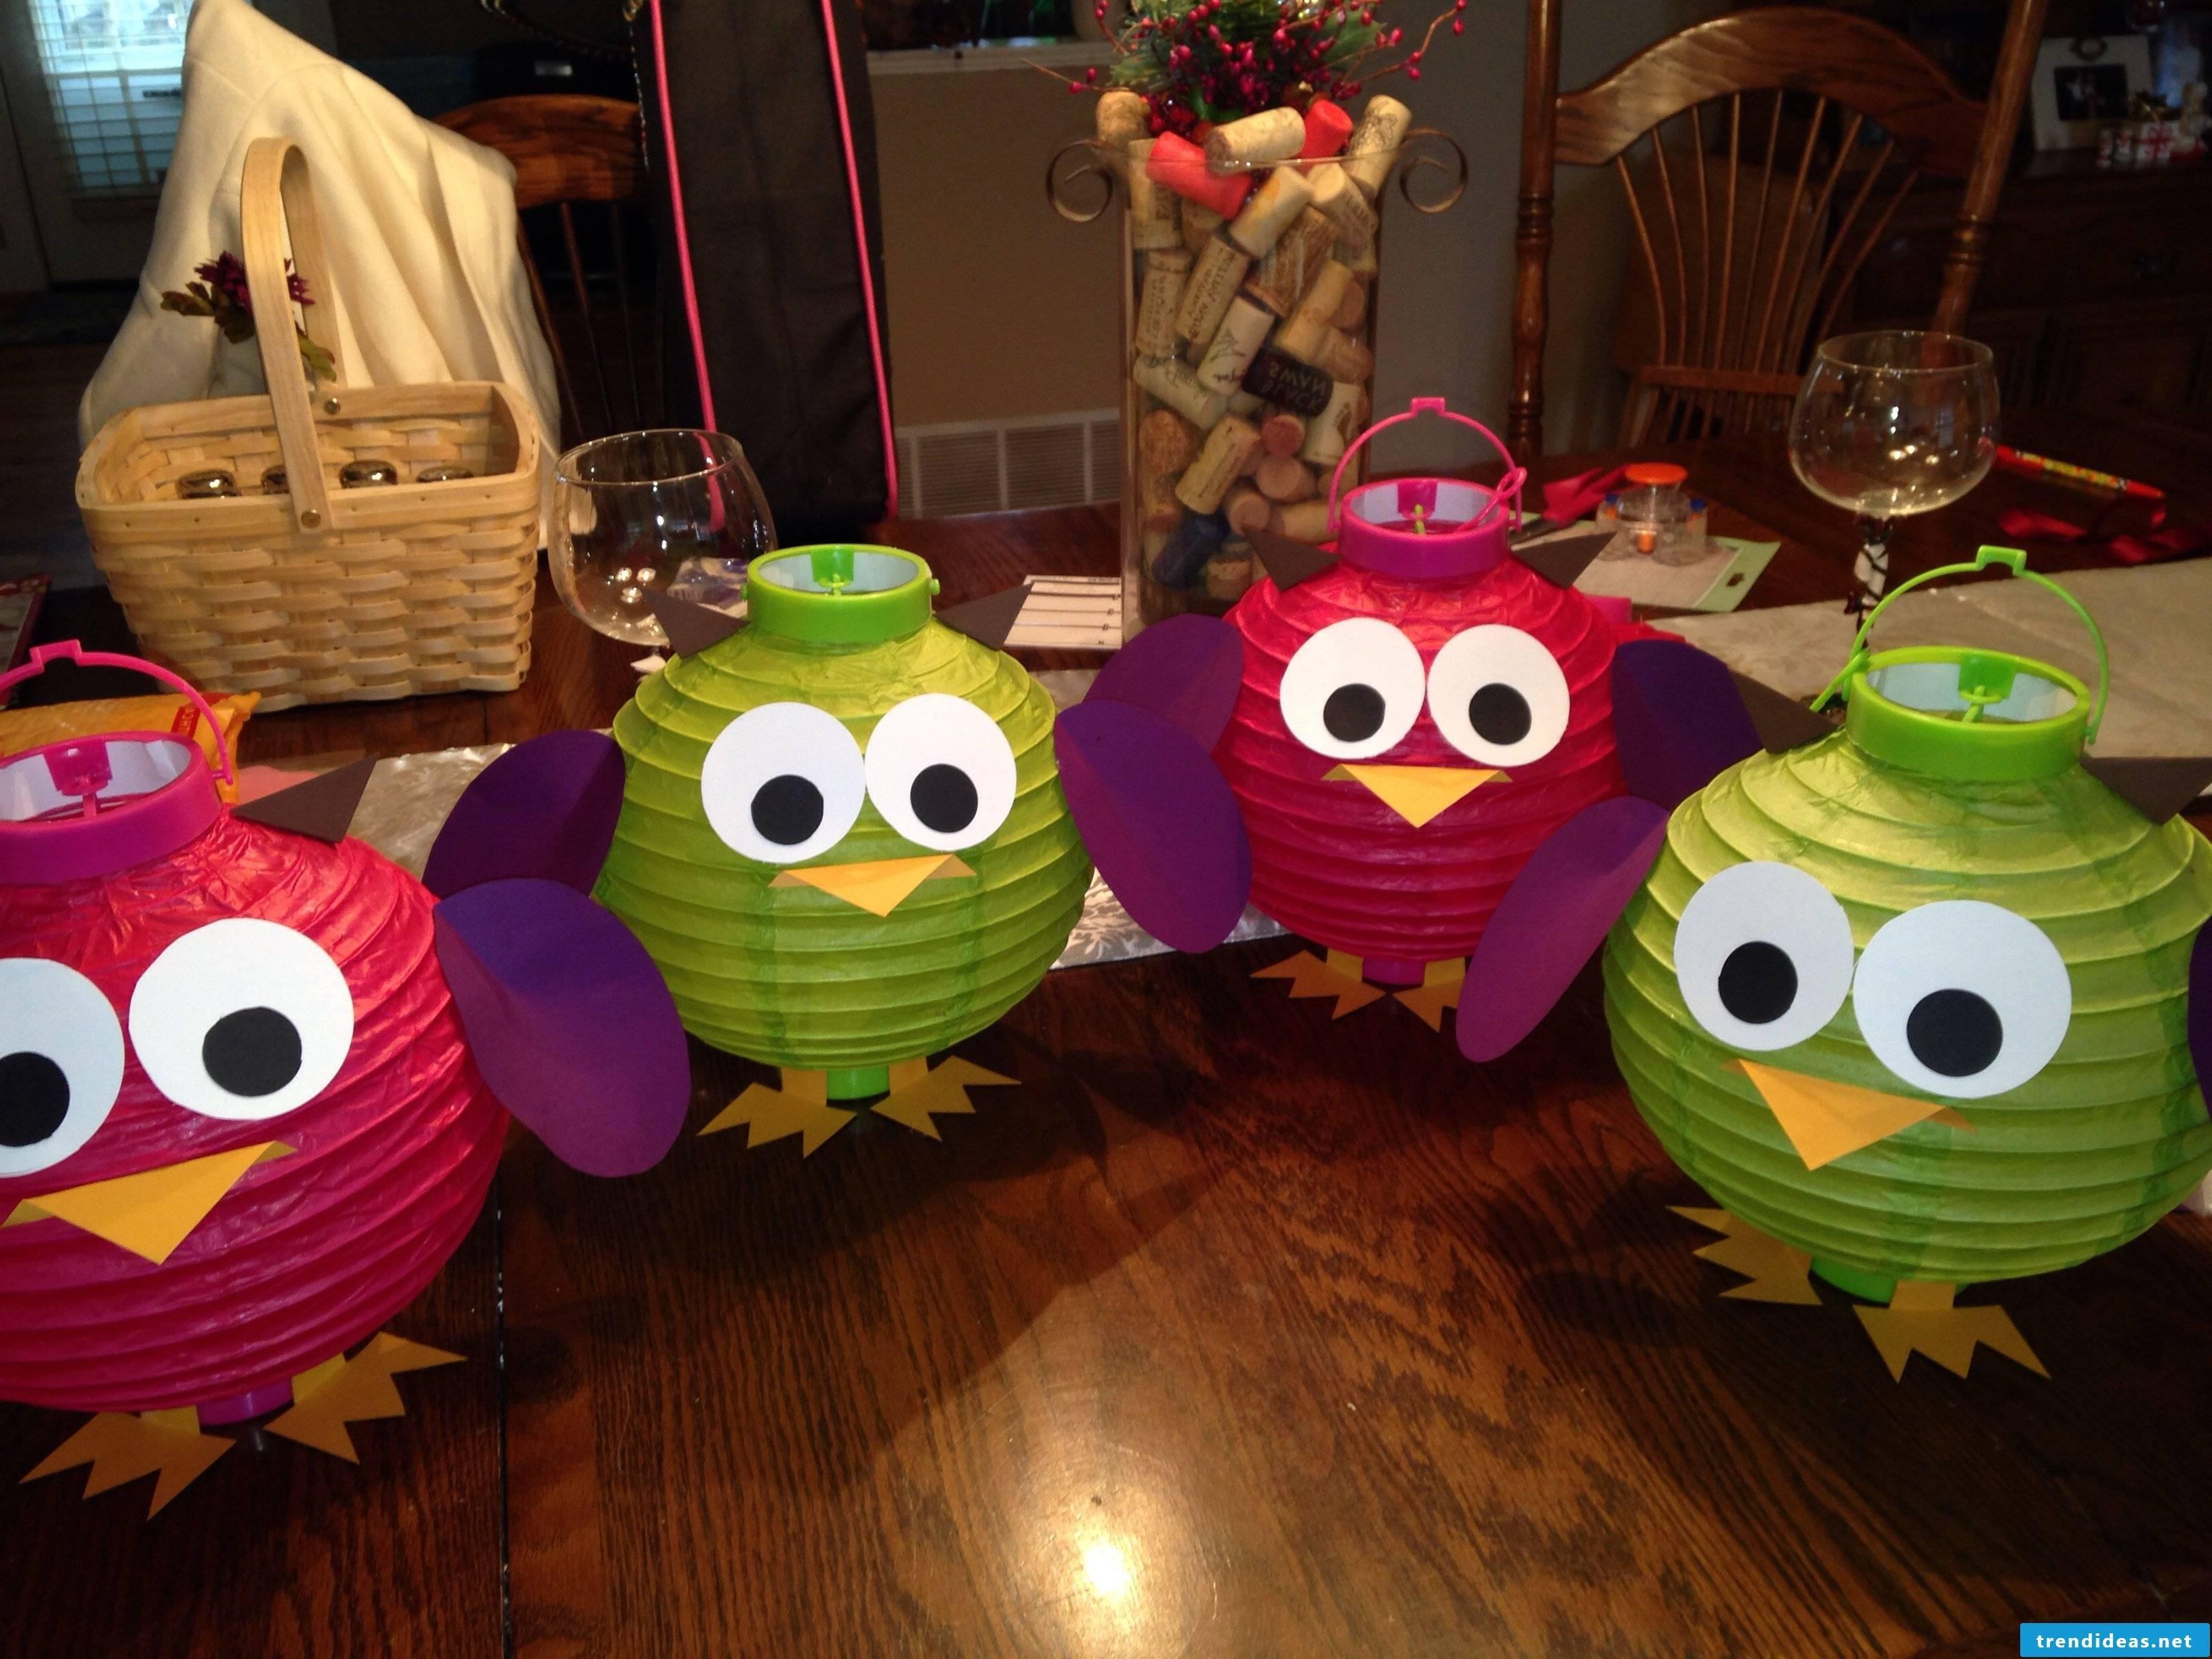 Owl lantern a great craft idea